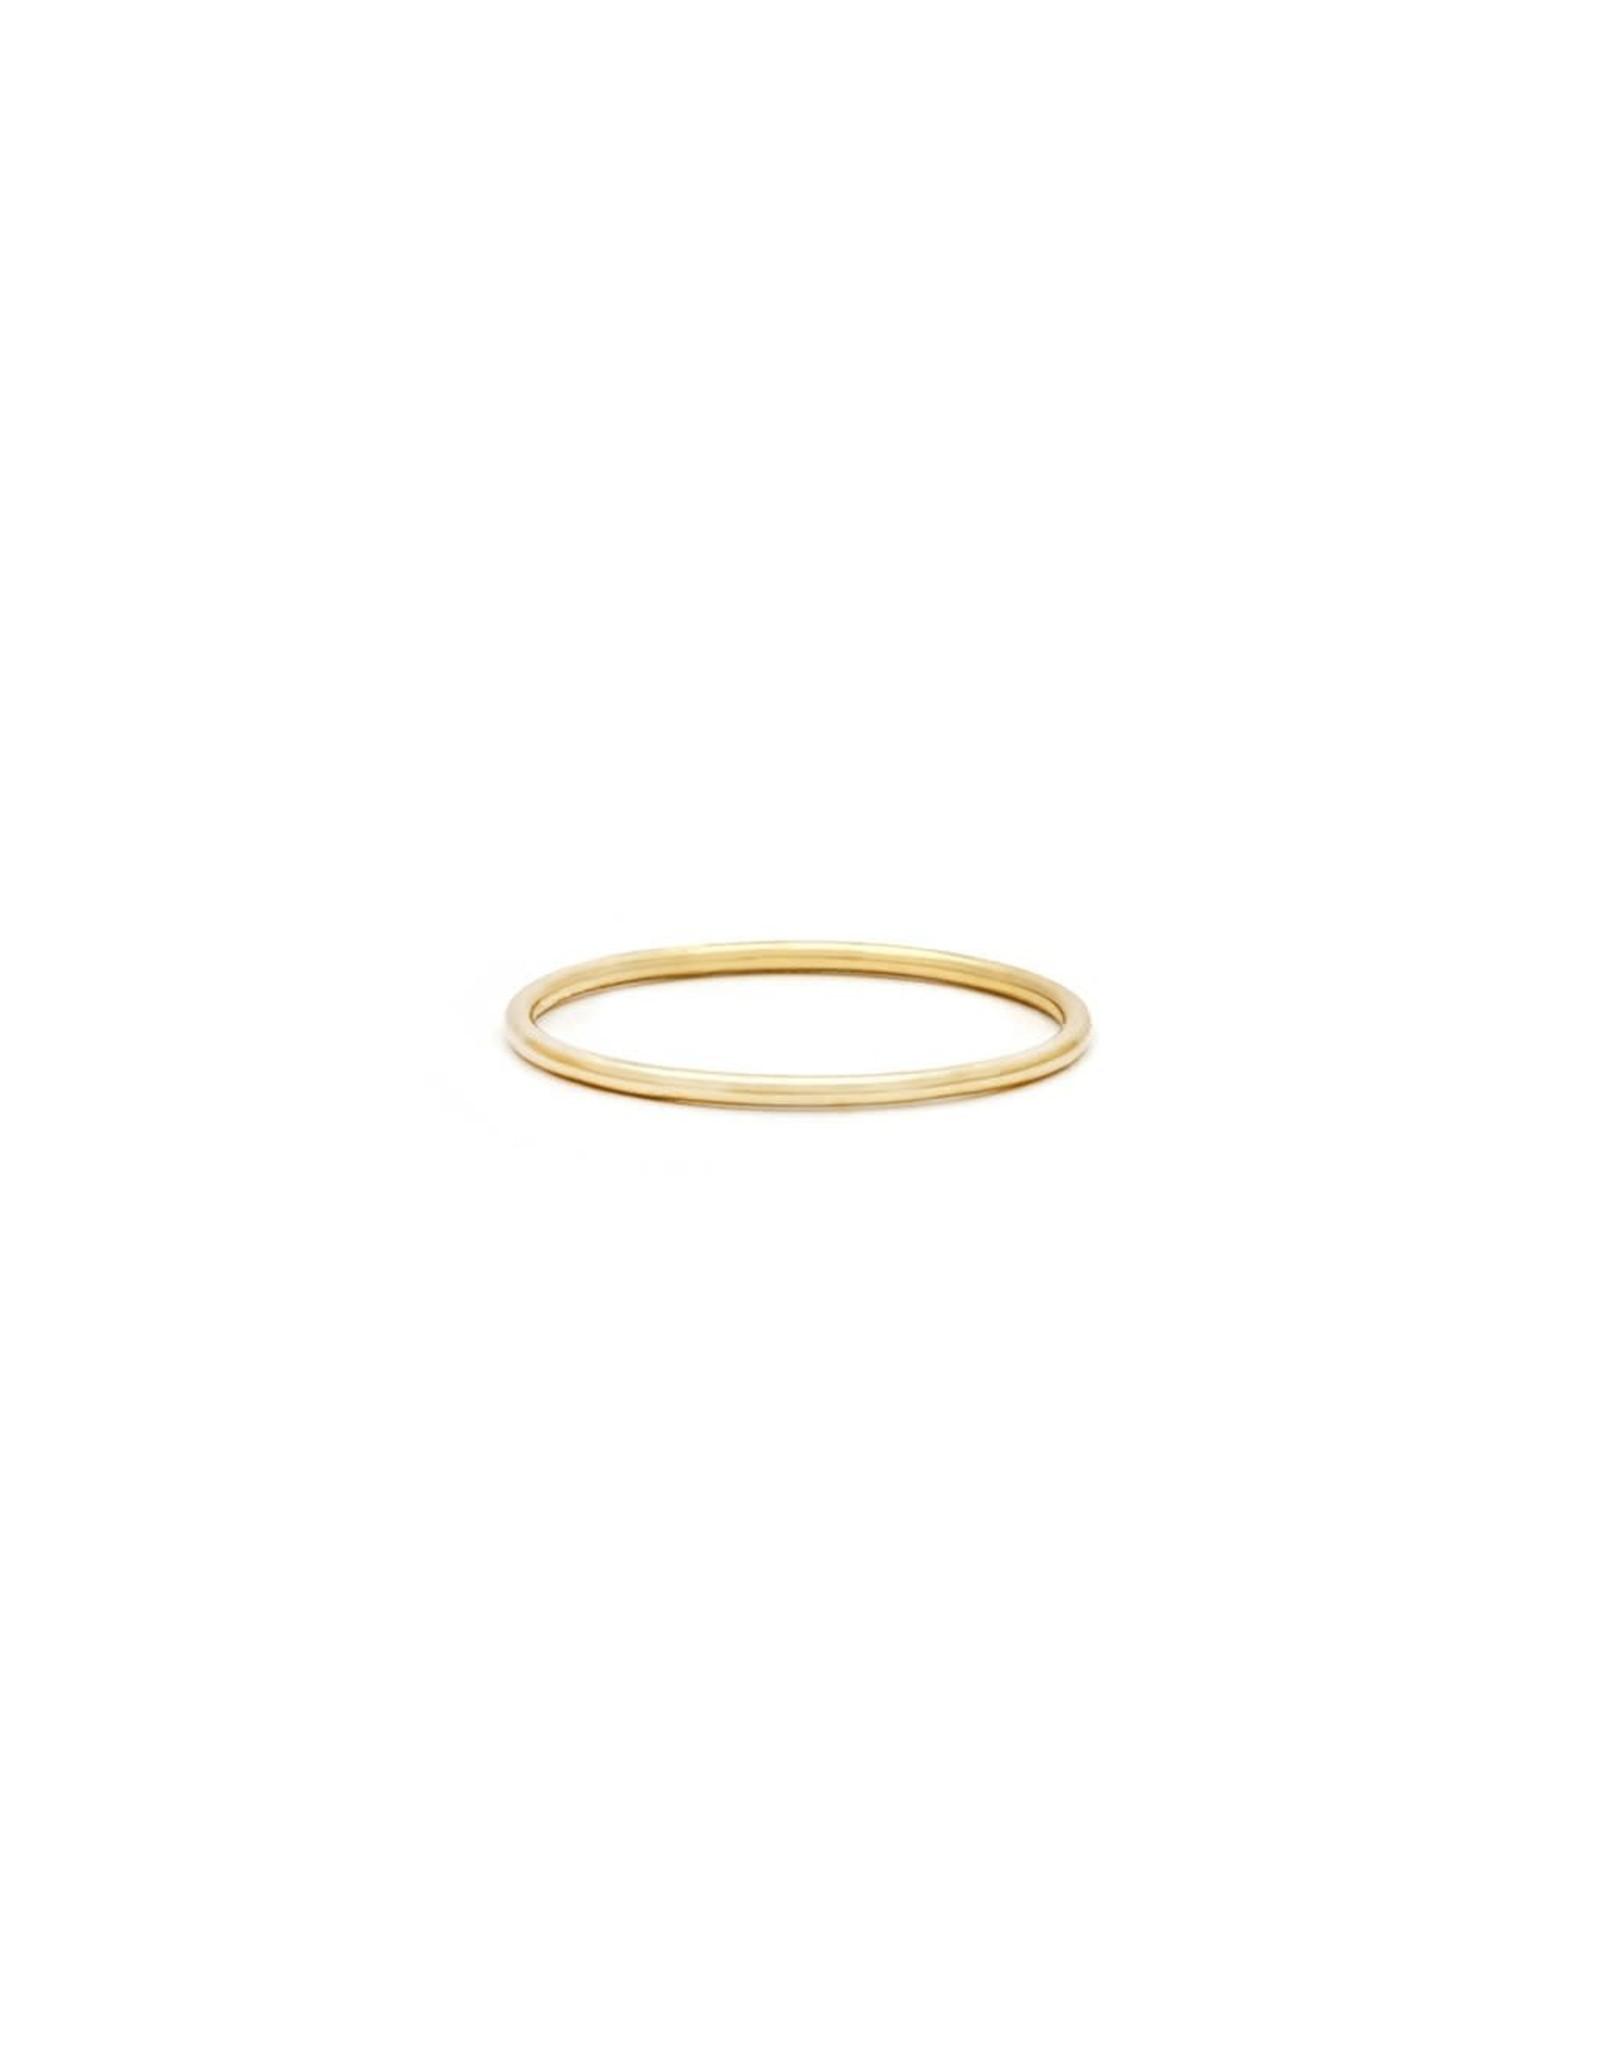 leah alexandra Stacking Ring | Goldfill